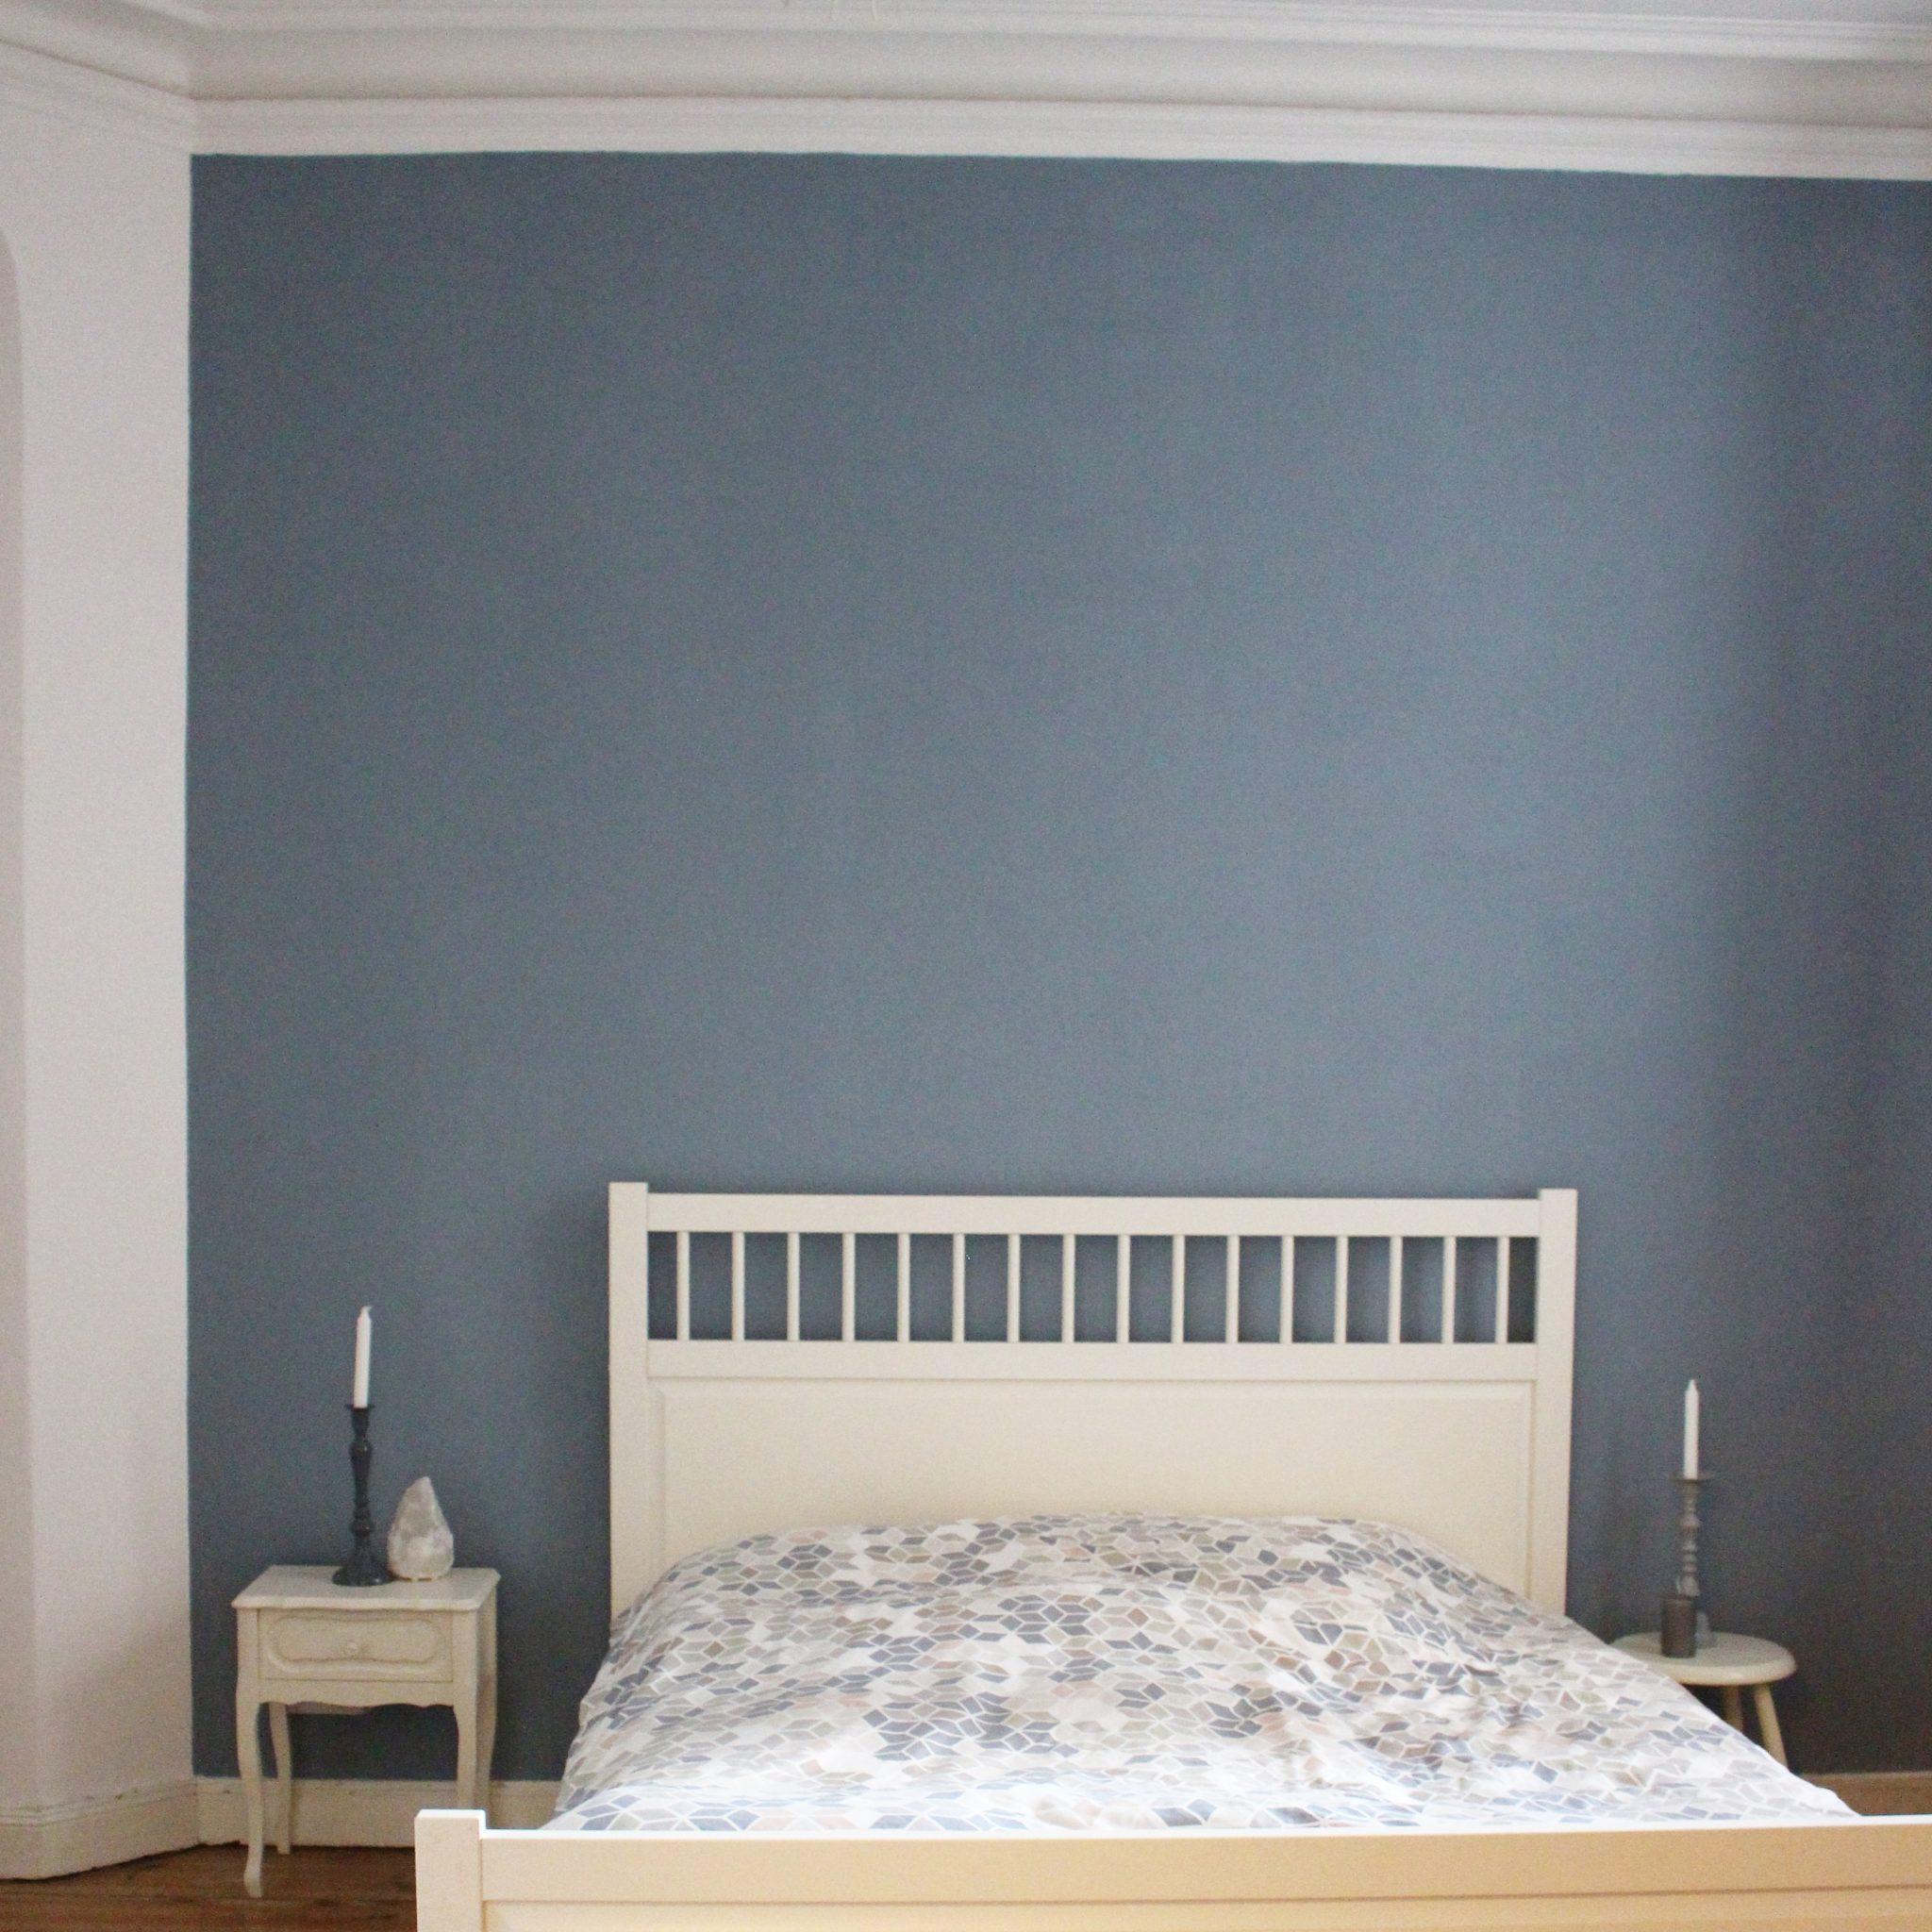 Schlafzimmer deko skandinavisch alpina4 sarahplusdrei for Deko skandinavisch